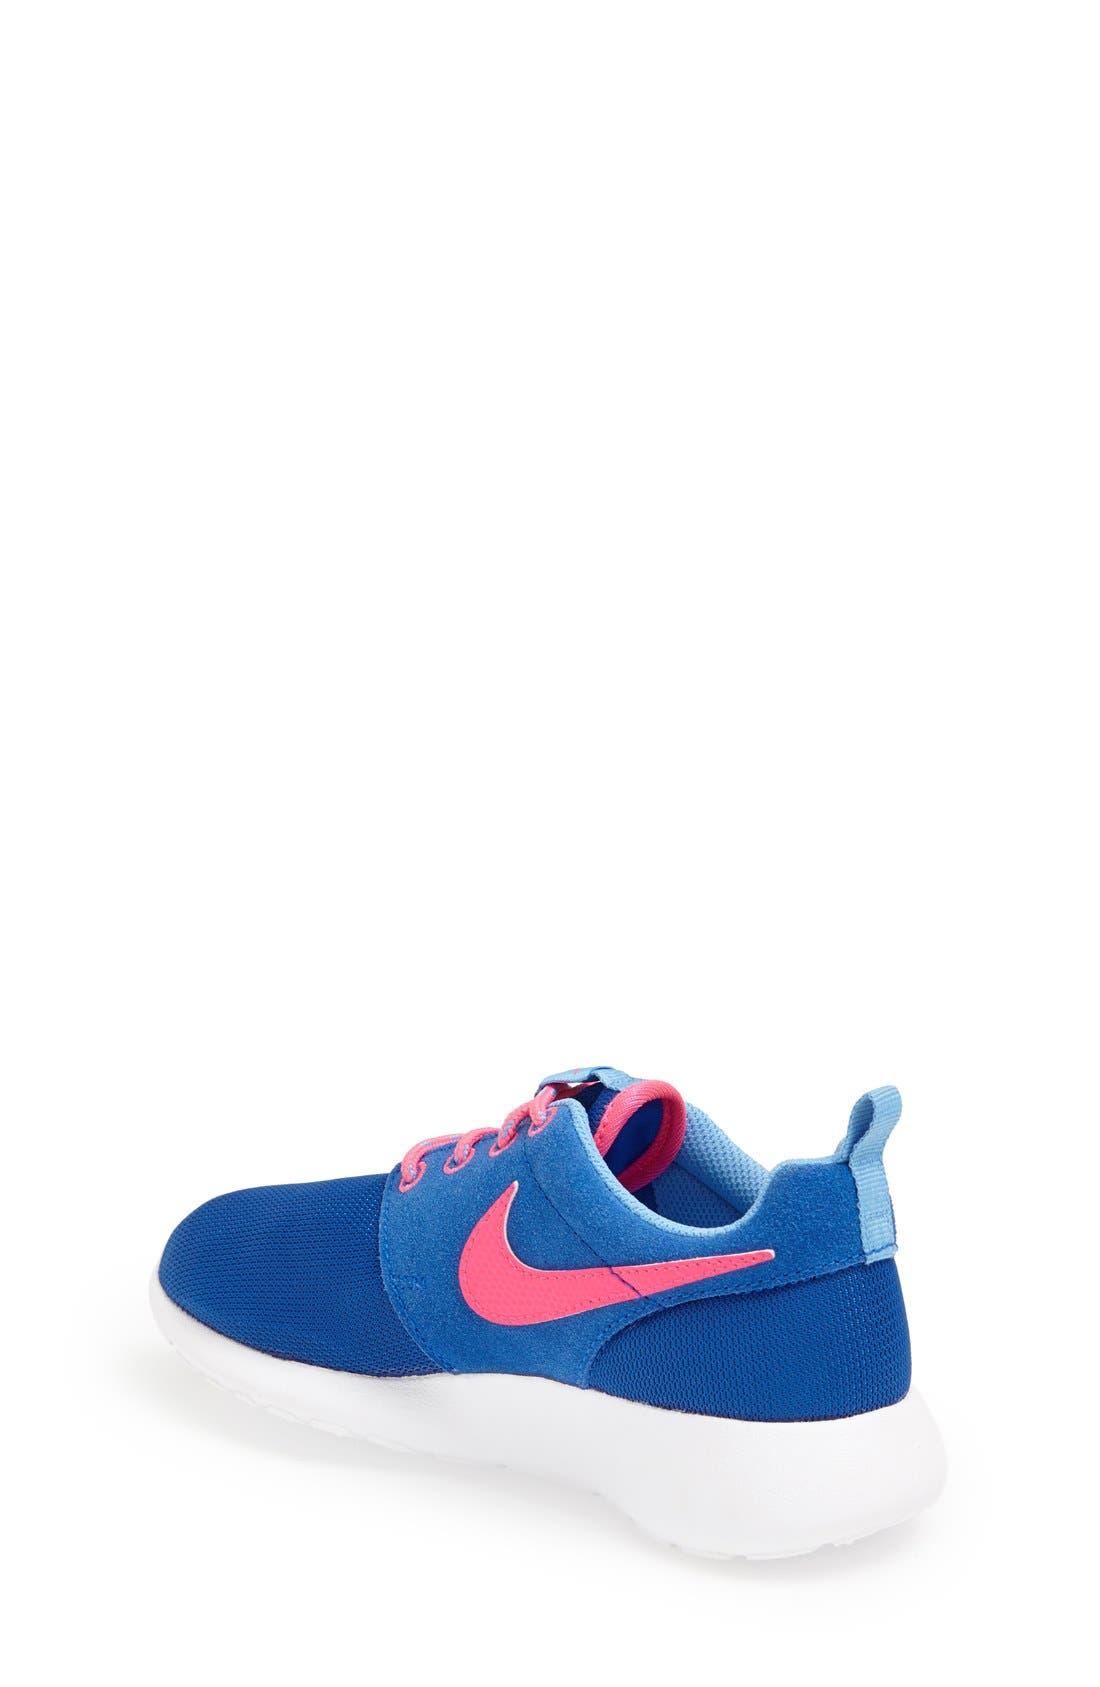 'Roshe Run' Athletic Shoe,                             Alternate thumbnail 88, color,